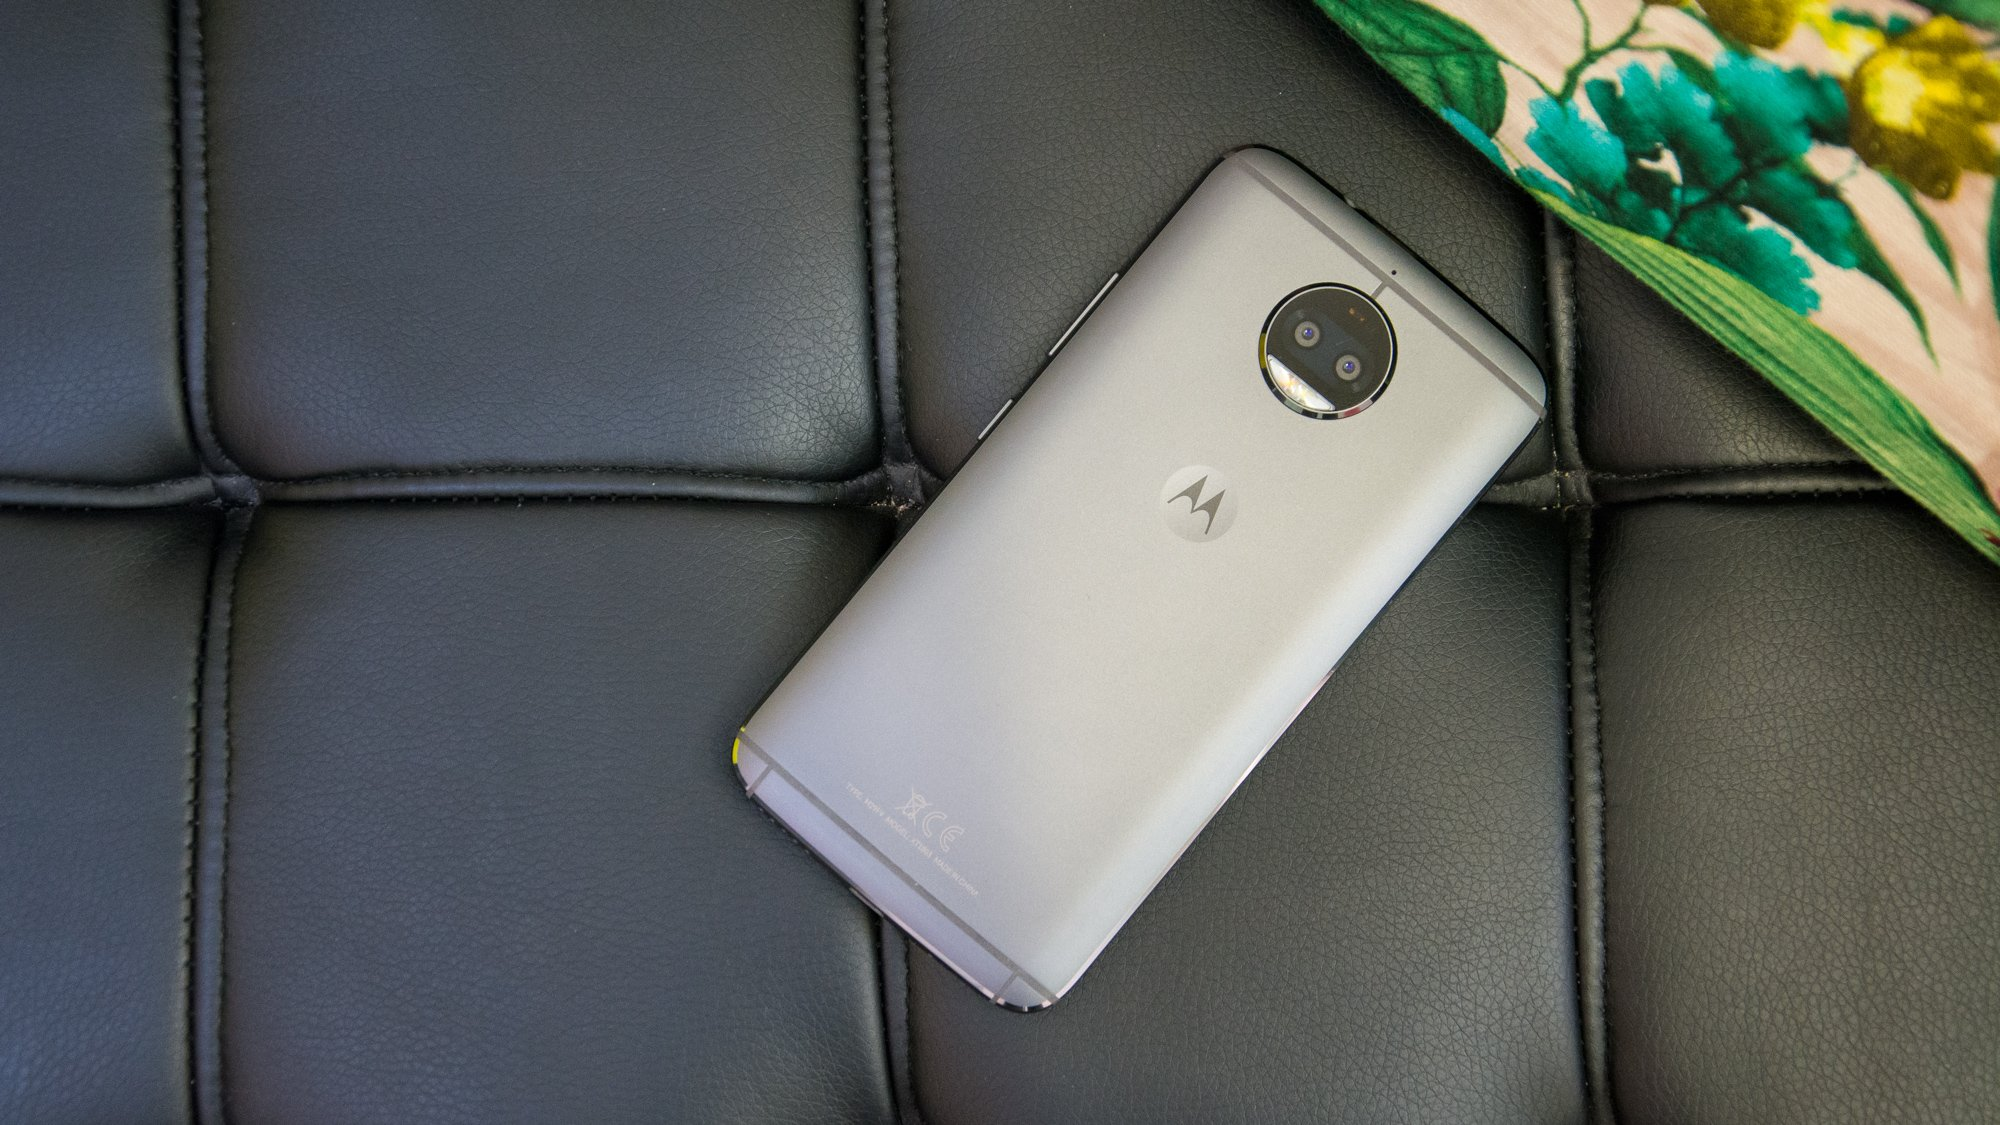 Motorola Moto G5s Plus Review Still Good But Outclassed